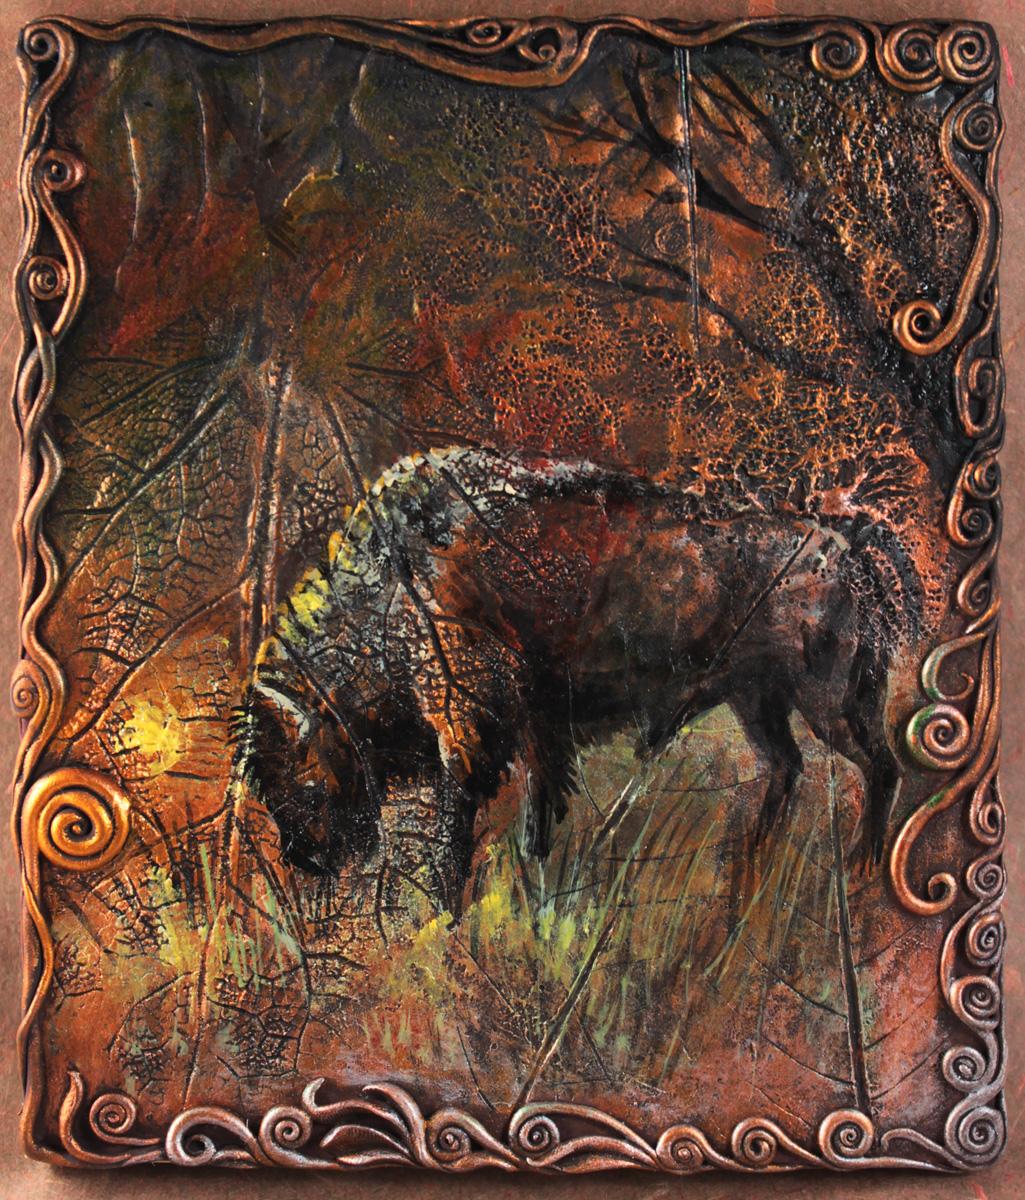 Bison in prairie by hontor